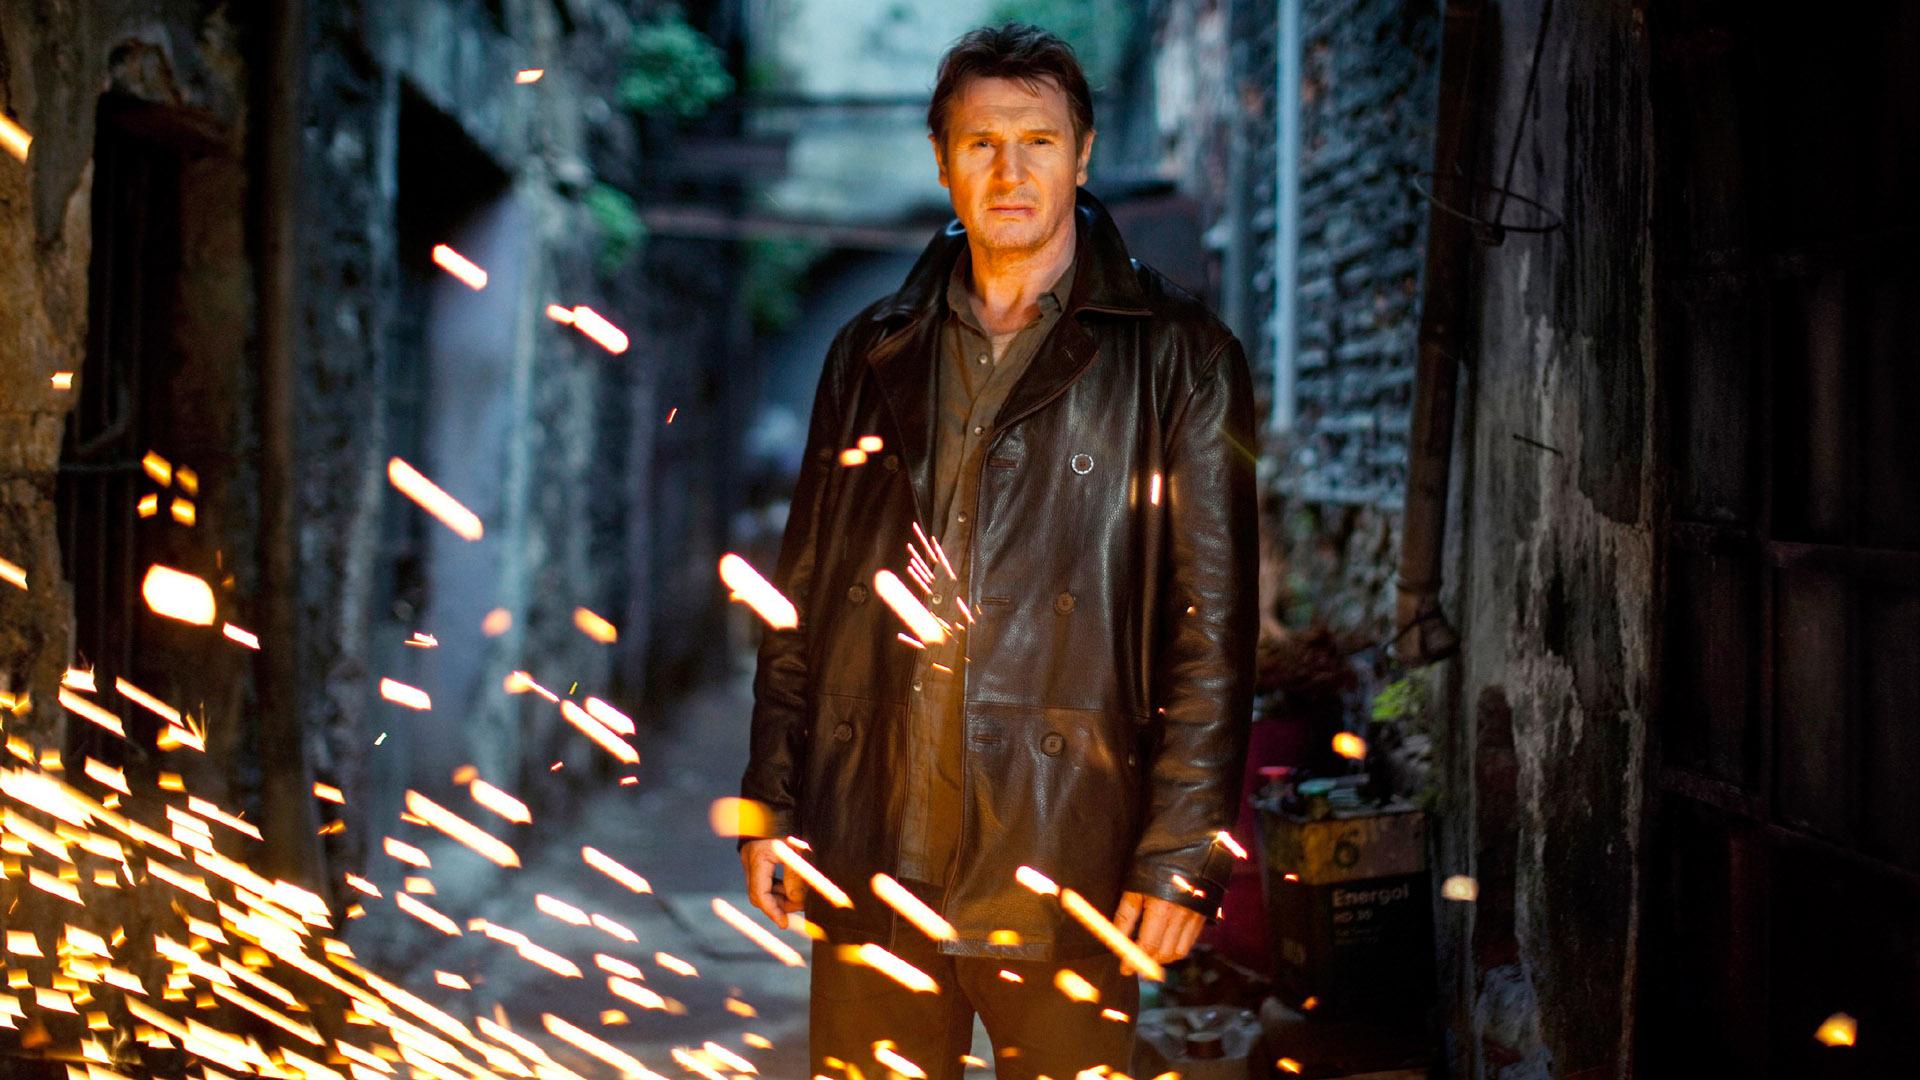 Ezért ugyanolyanok Liam Neeson akciófilmjei